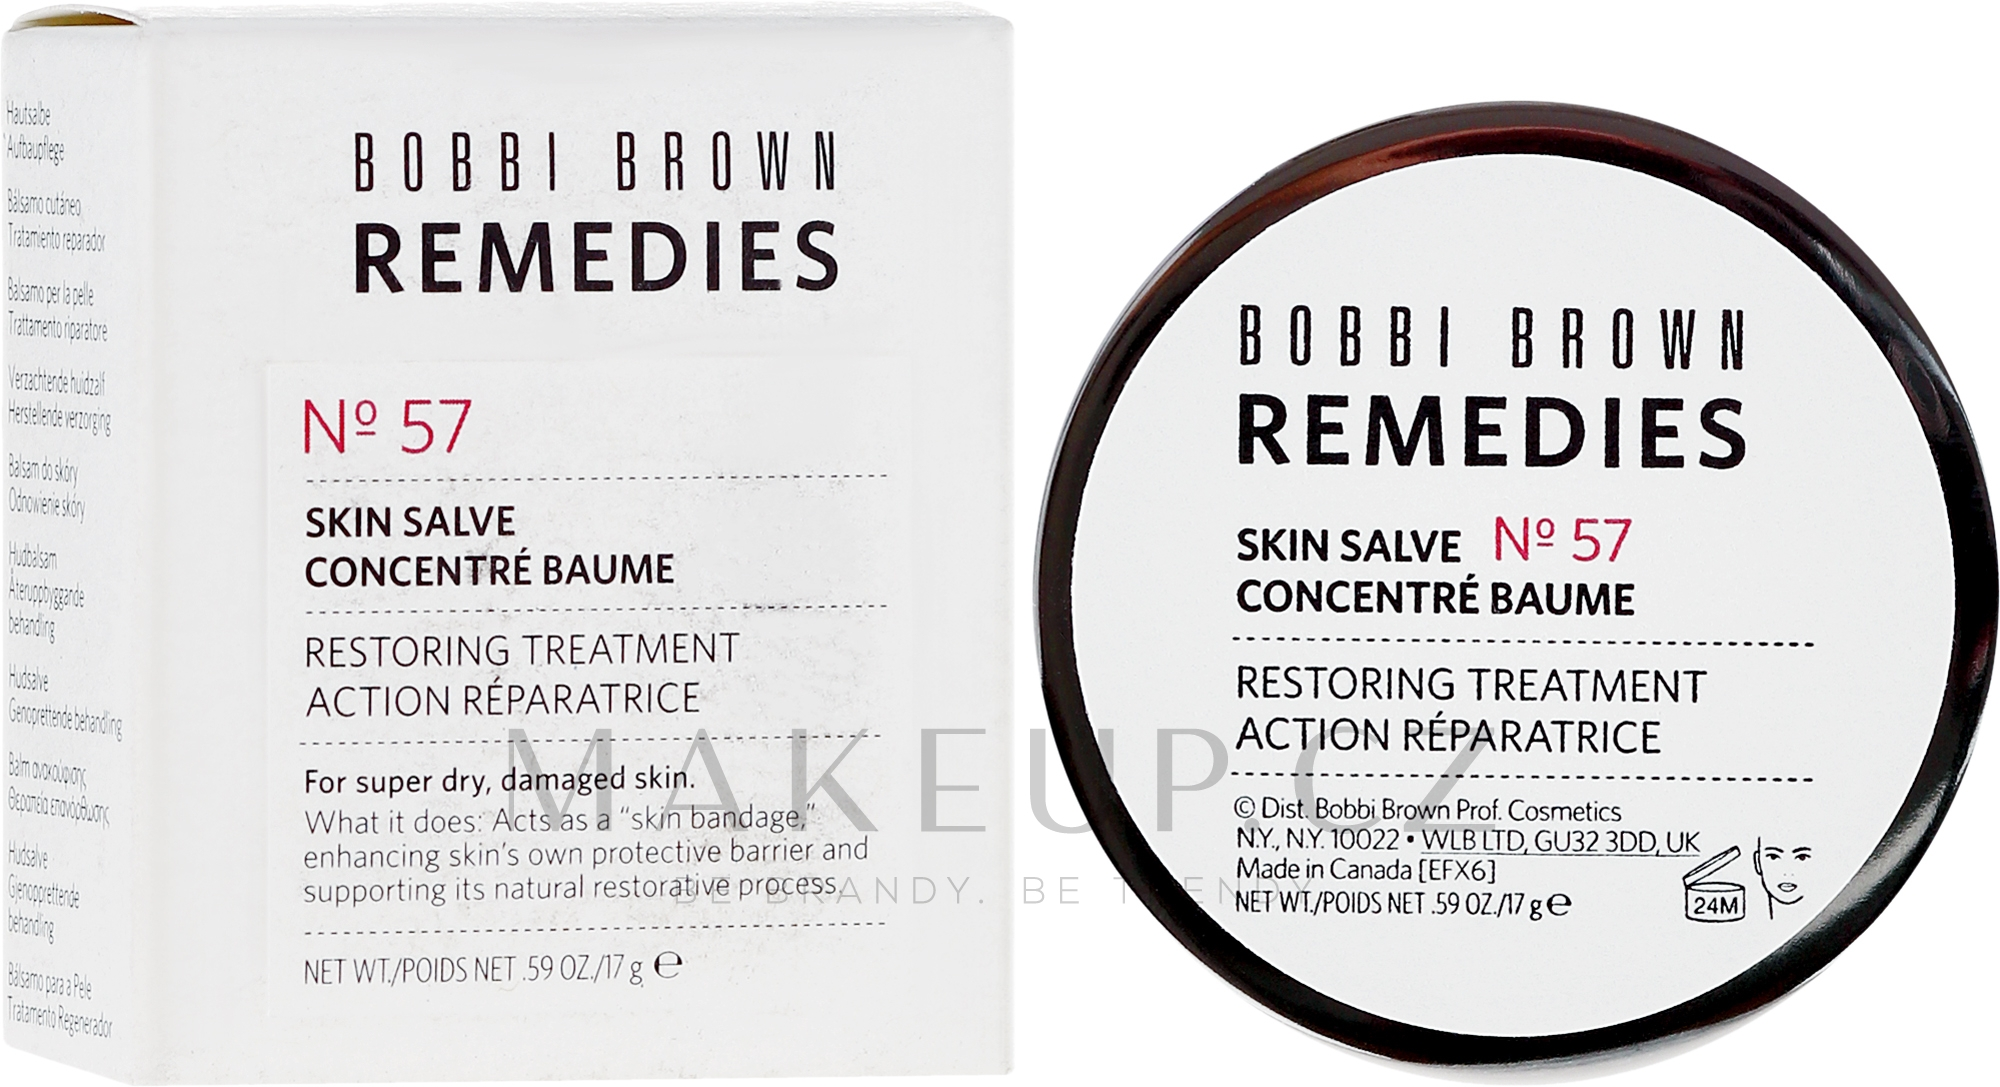 Balzám pro obnovu pleti - Bobbi Brown Remedies Skin Salve №57 — foto 17 g